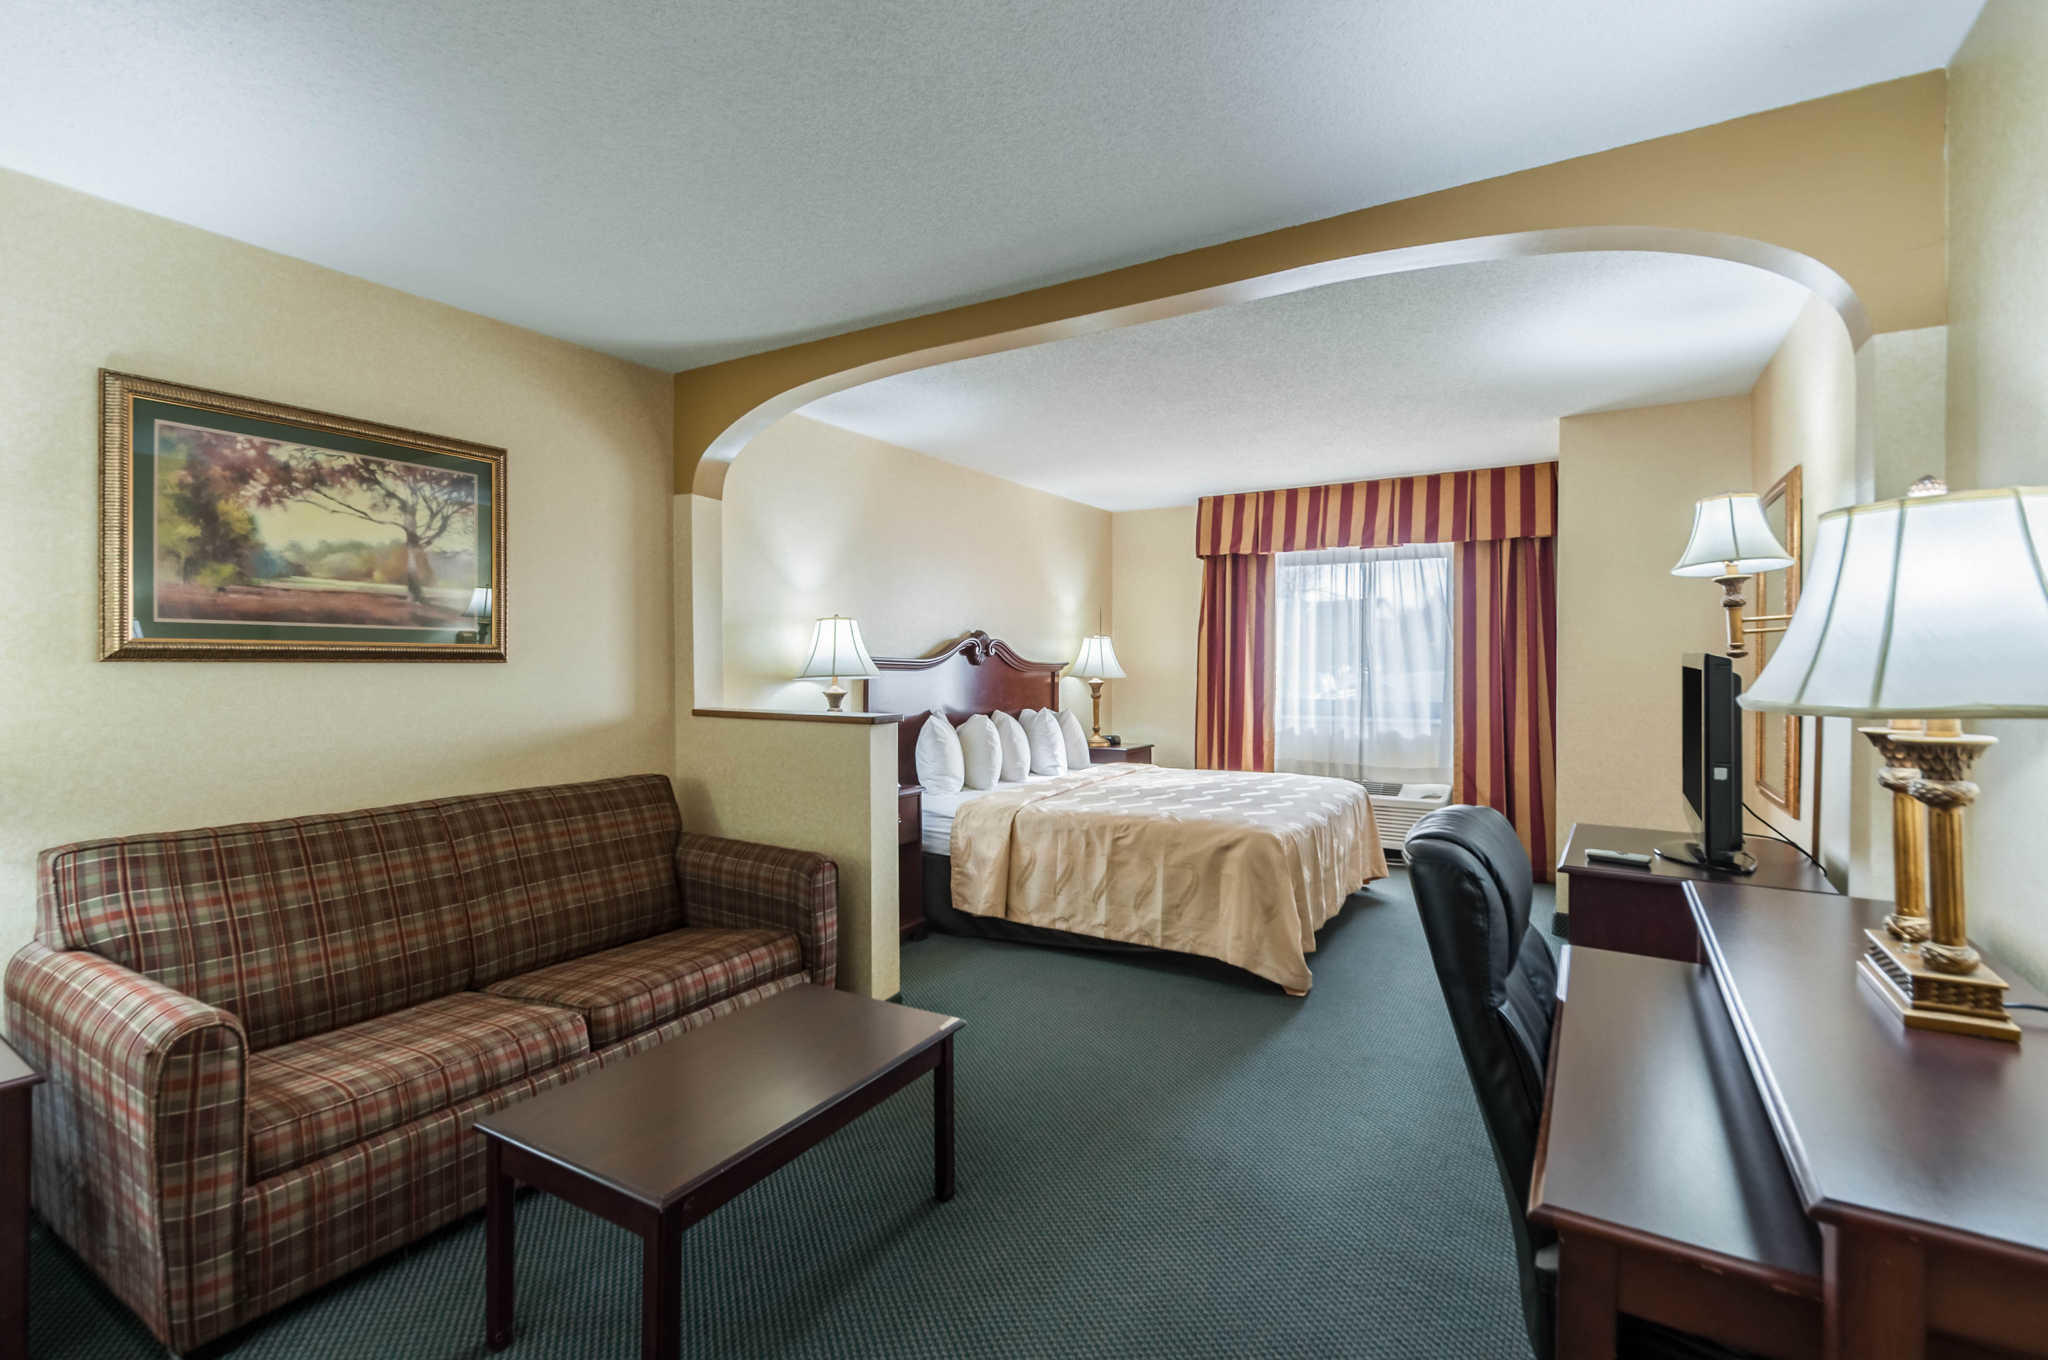 Quality Suites image 0